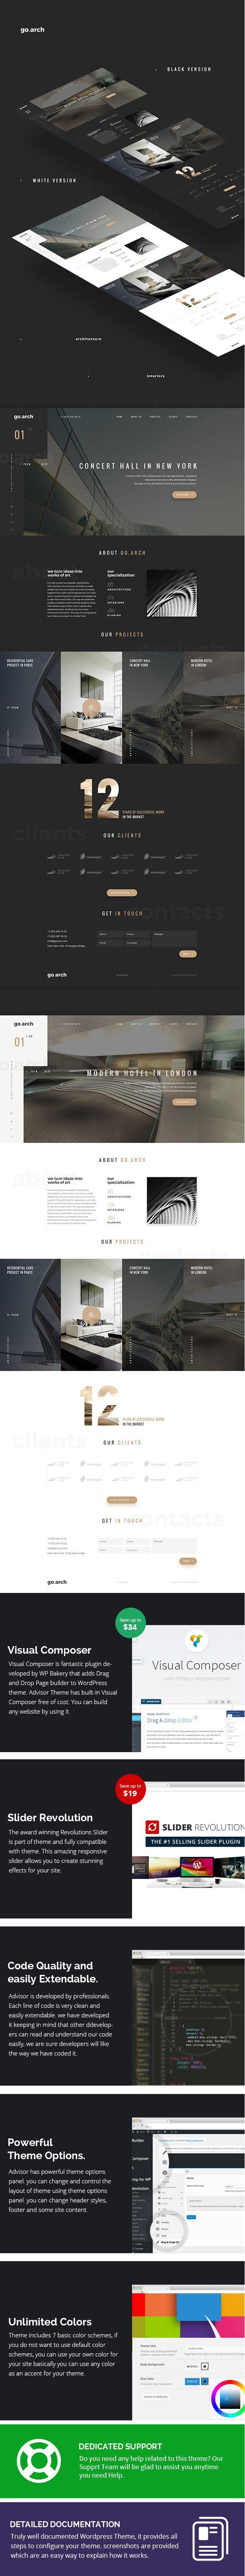 go.arch - Architecture & Interior WordPress Theme #building #construction #decor • Download ➝ https://themeforest.net/item/goarch-architecture-interior-wordpress-theme/18711712?ref=pxcr